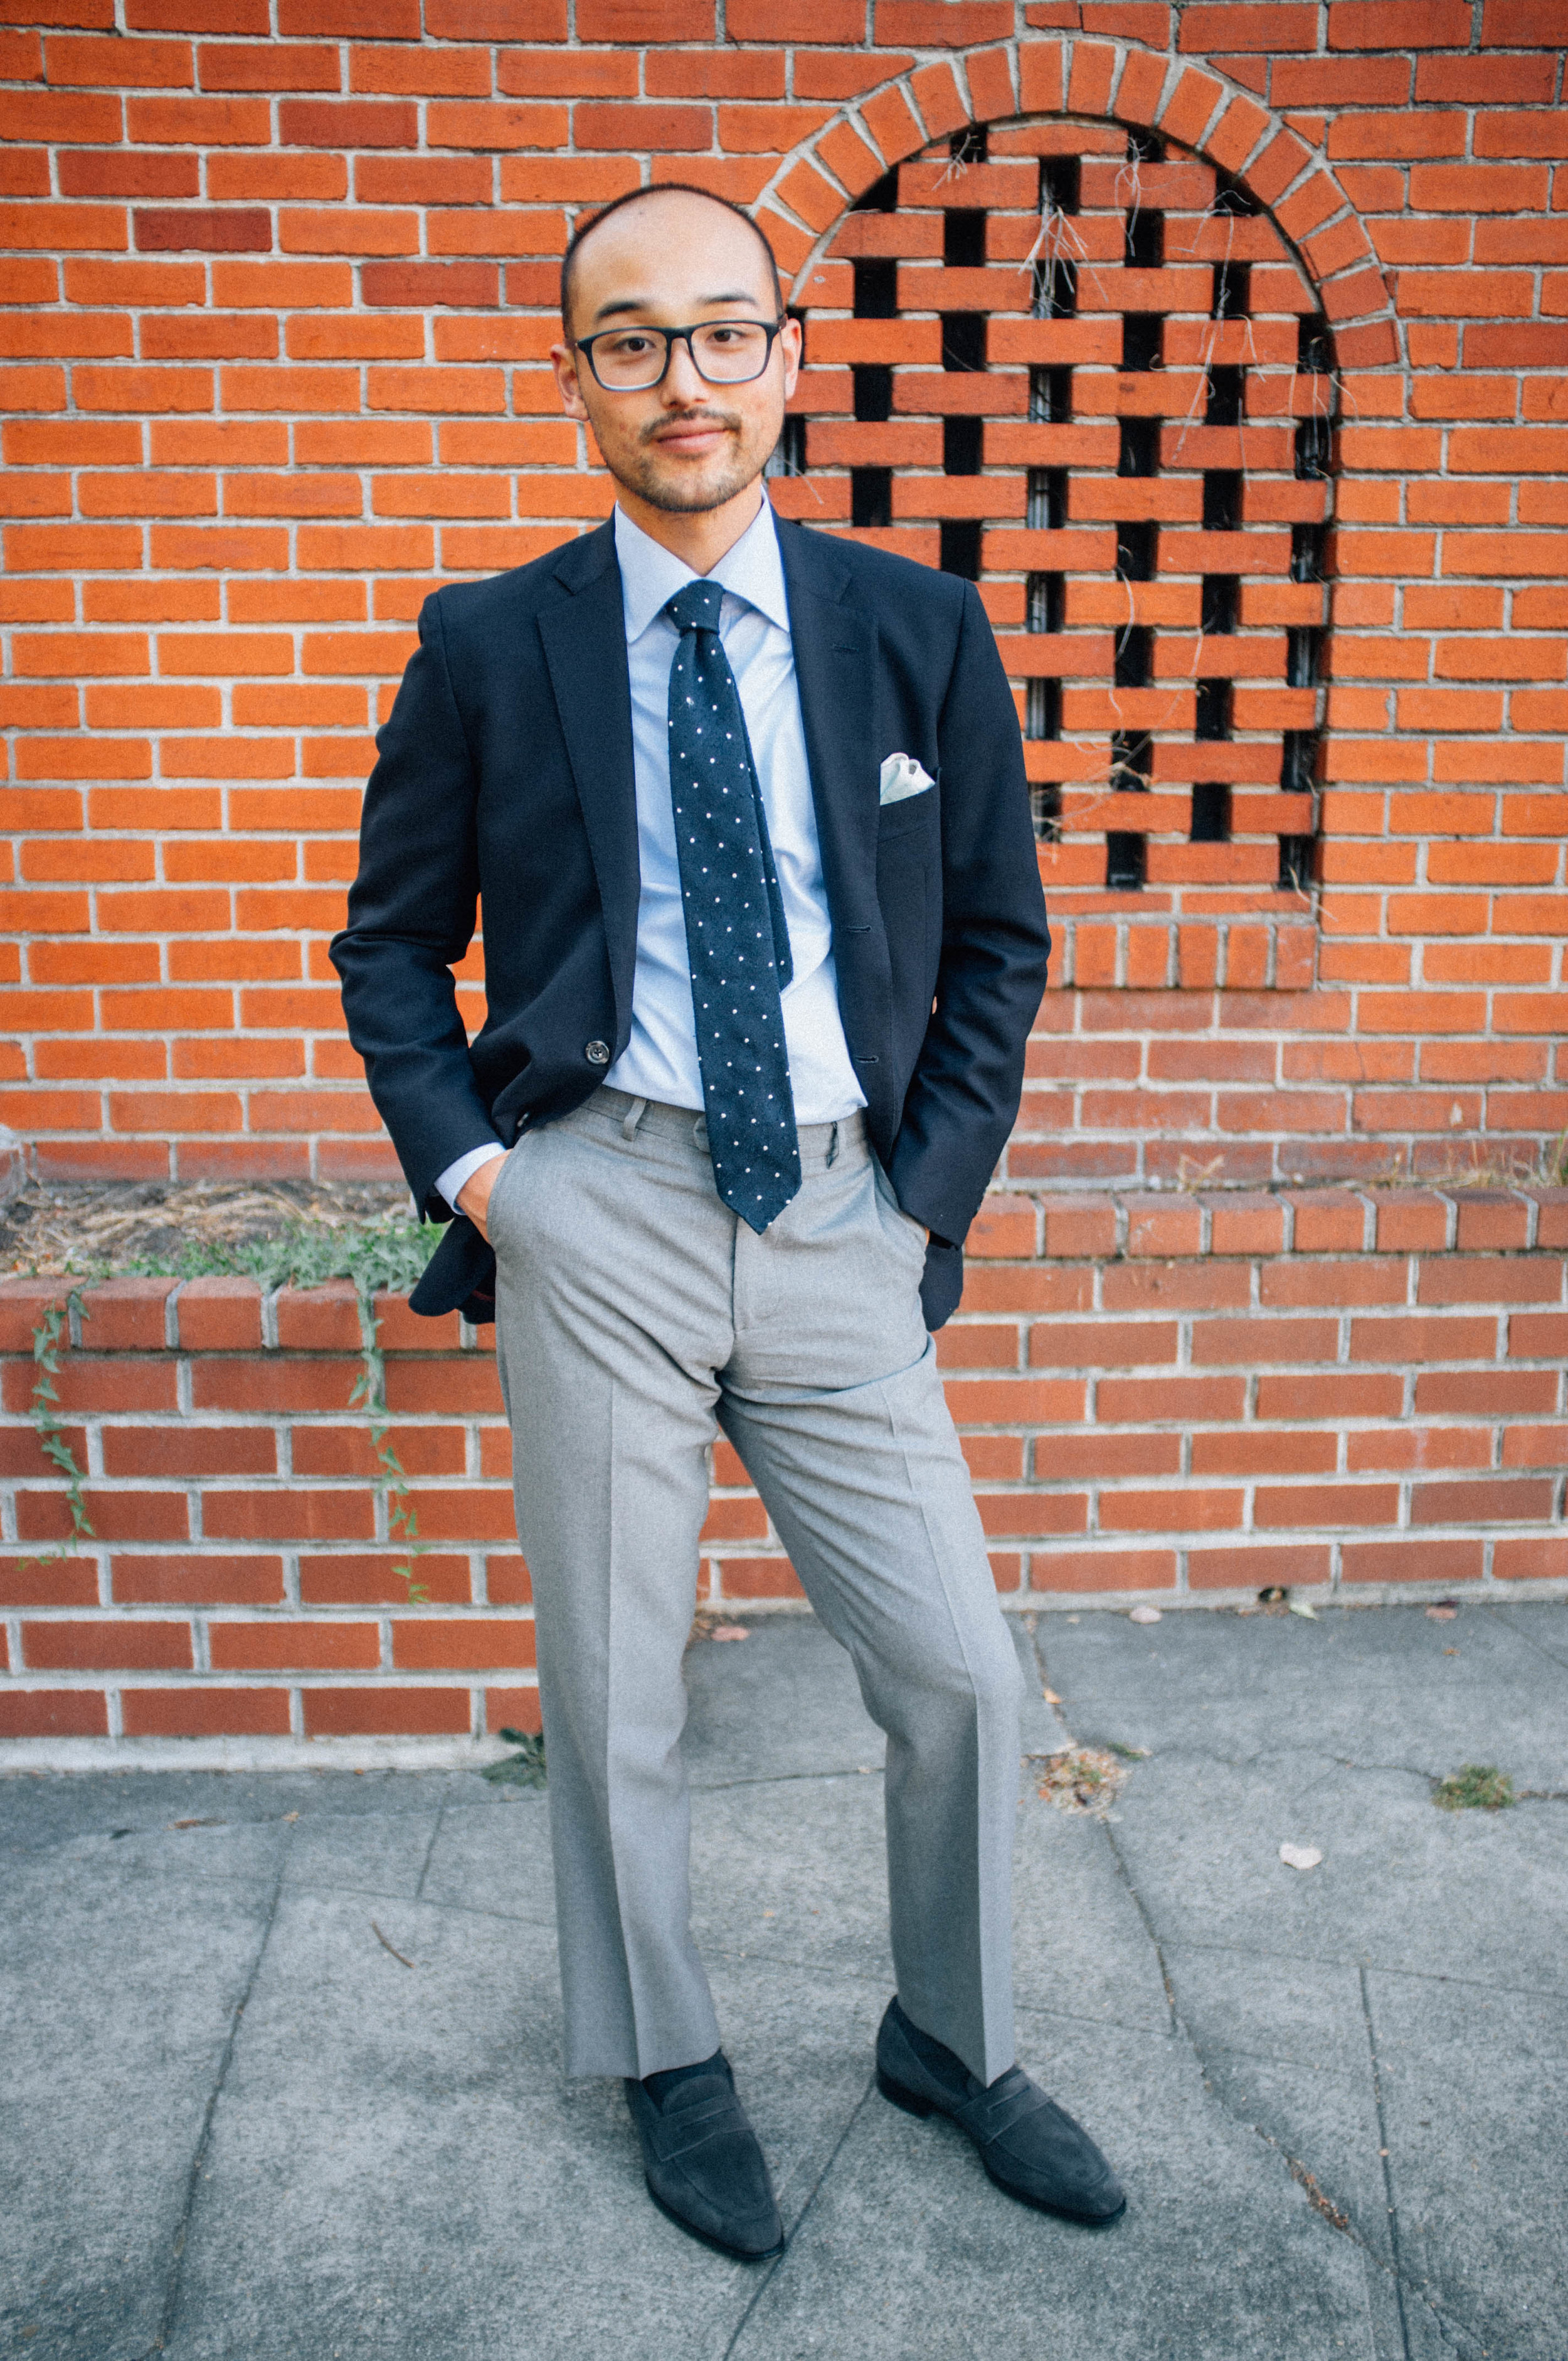 Glasses - Barton Perreira | Sports Coat - Epaulet | Shirt - Proper Cloth | Tie - Drake's London | Pocket Square - Rubinacci | Trousers - Epaulet | Shoes - Kingsman by George Cleverley